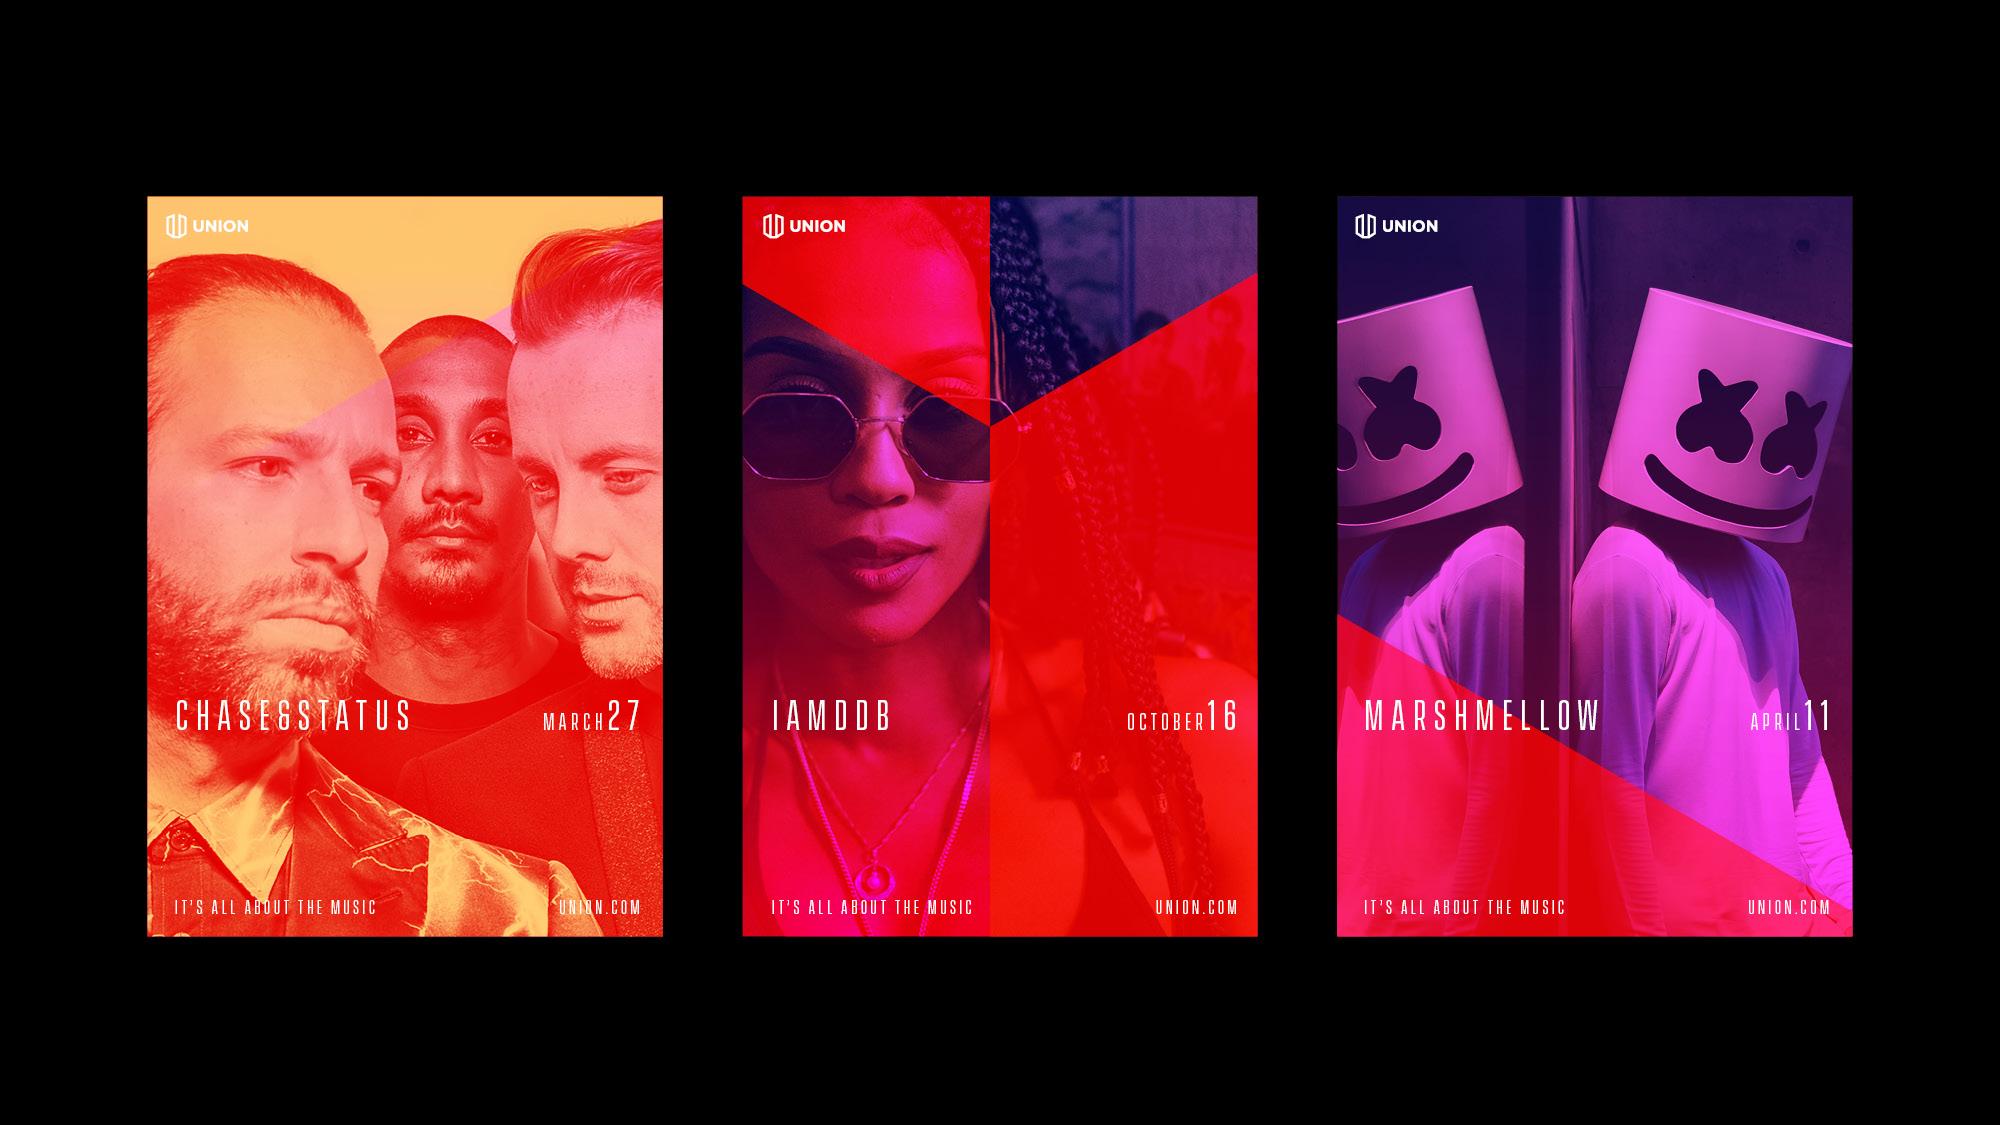 Nacione-Branding-Union-IV-Music10